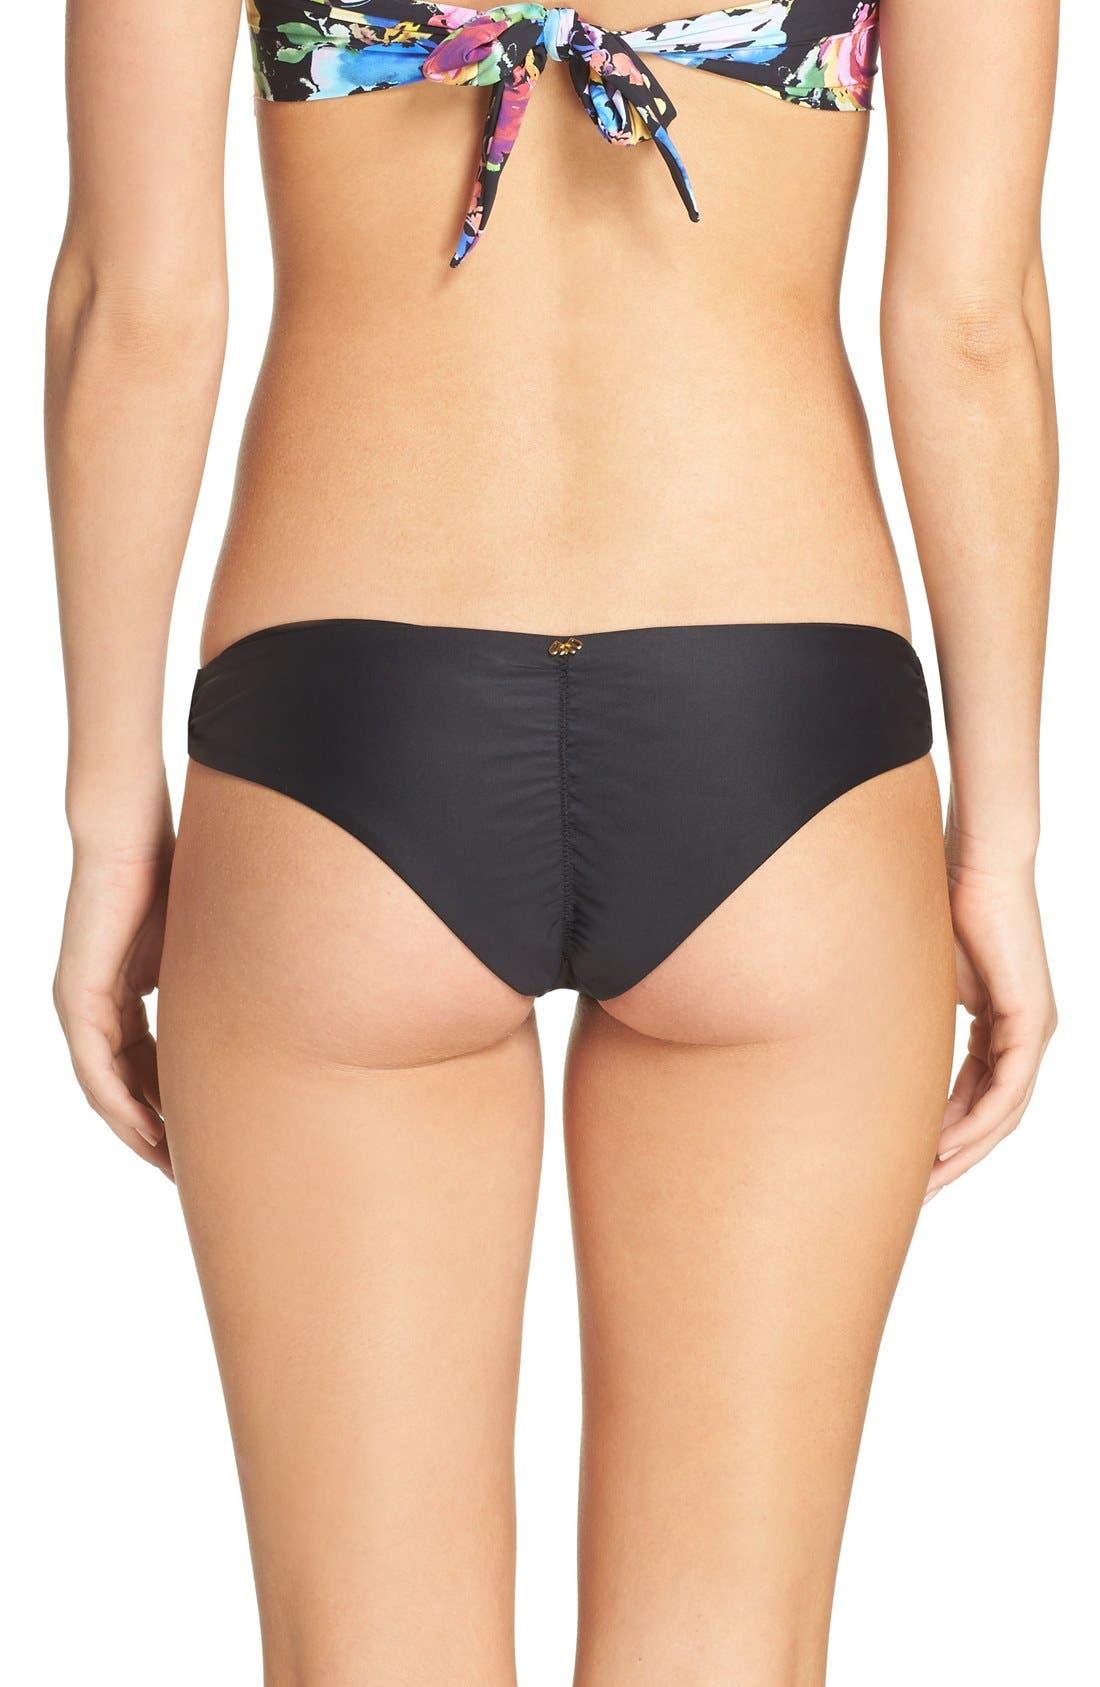 PilyQ Bikini Bottoms